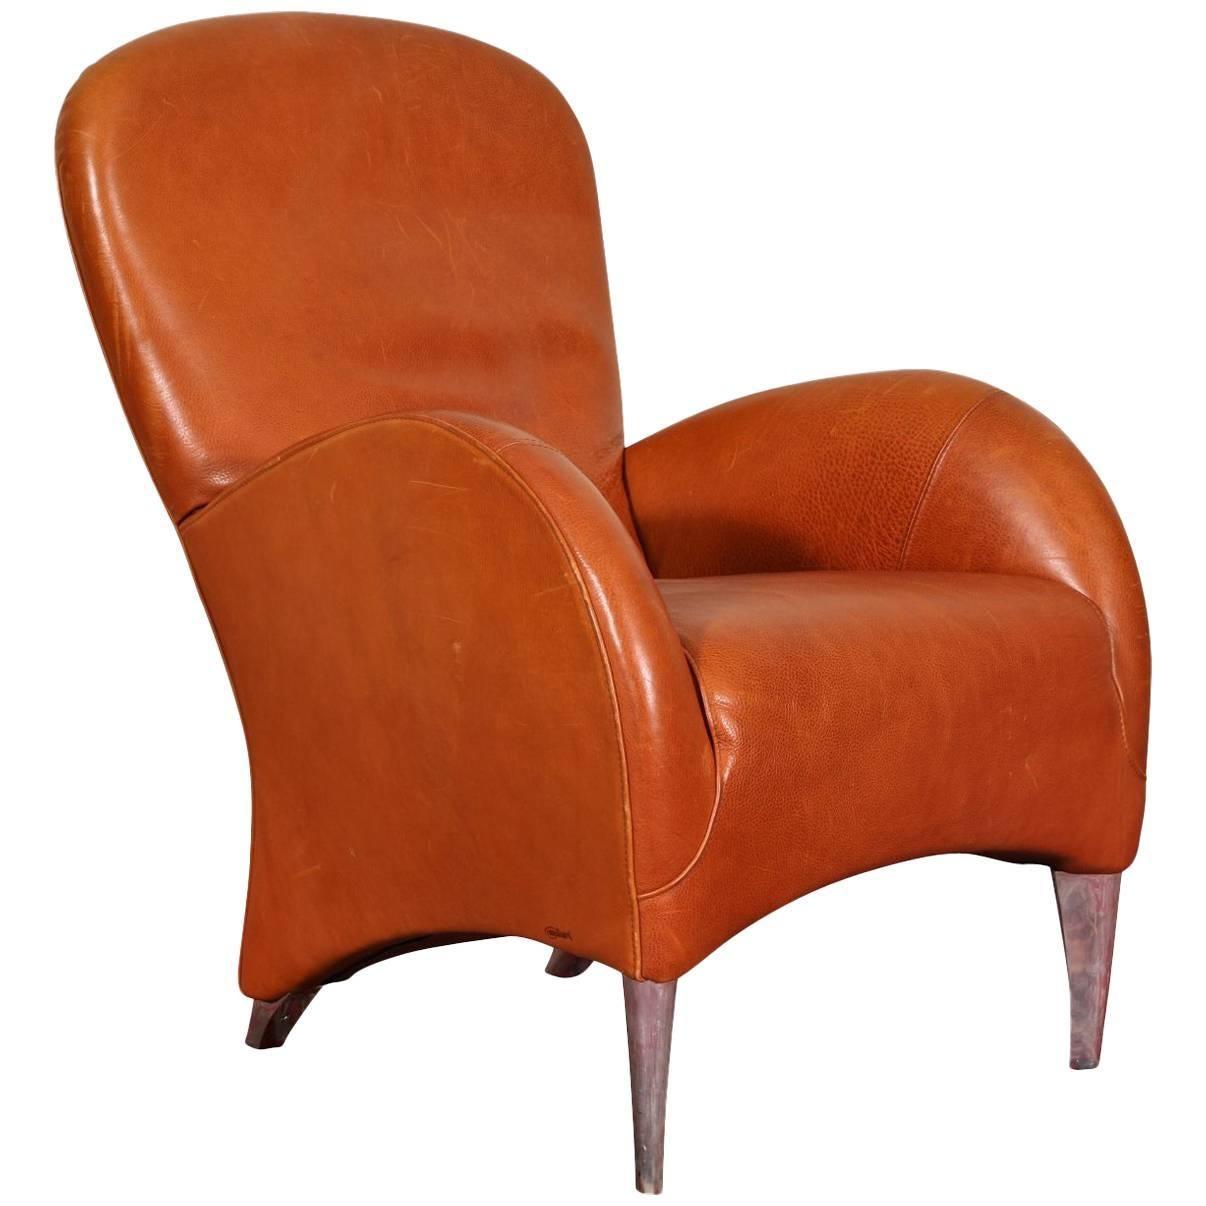 Vintage Molinari Tobacco Leather Armchair